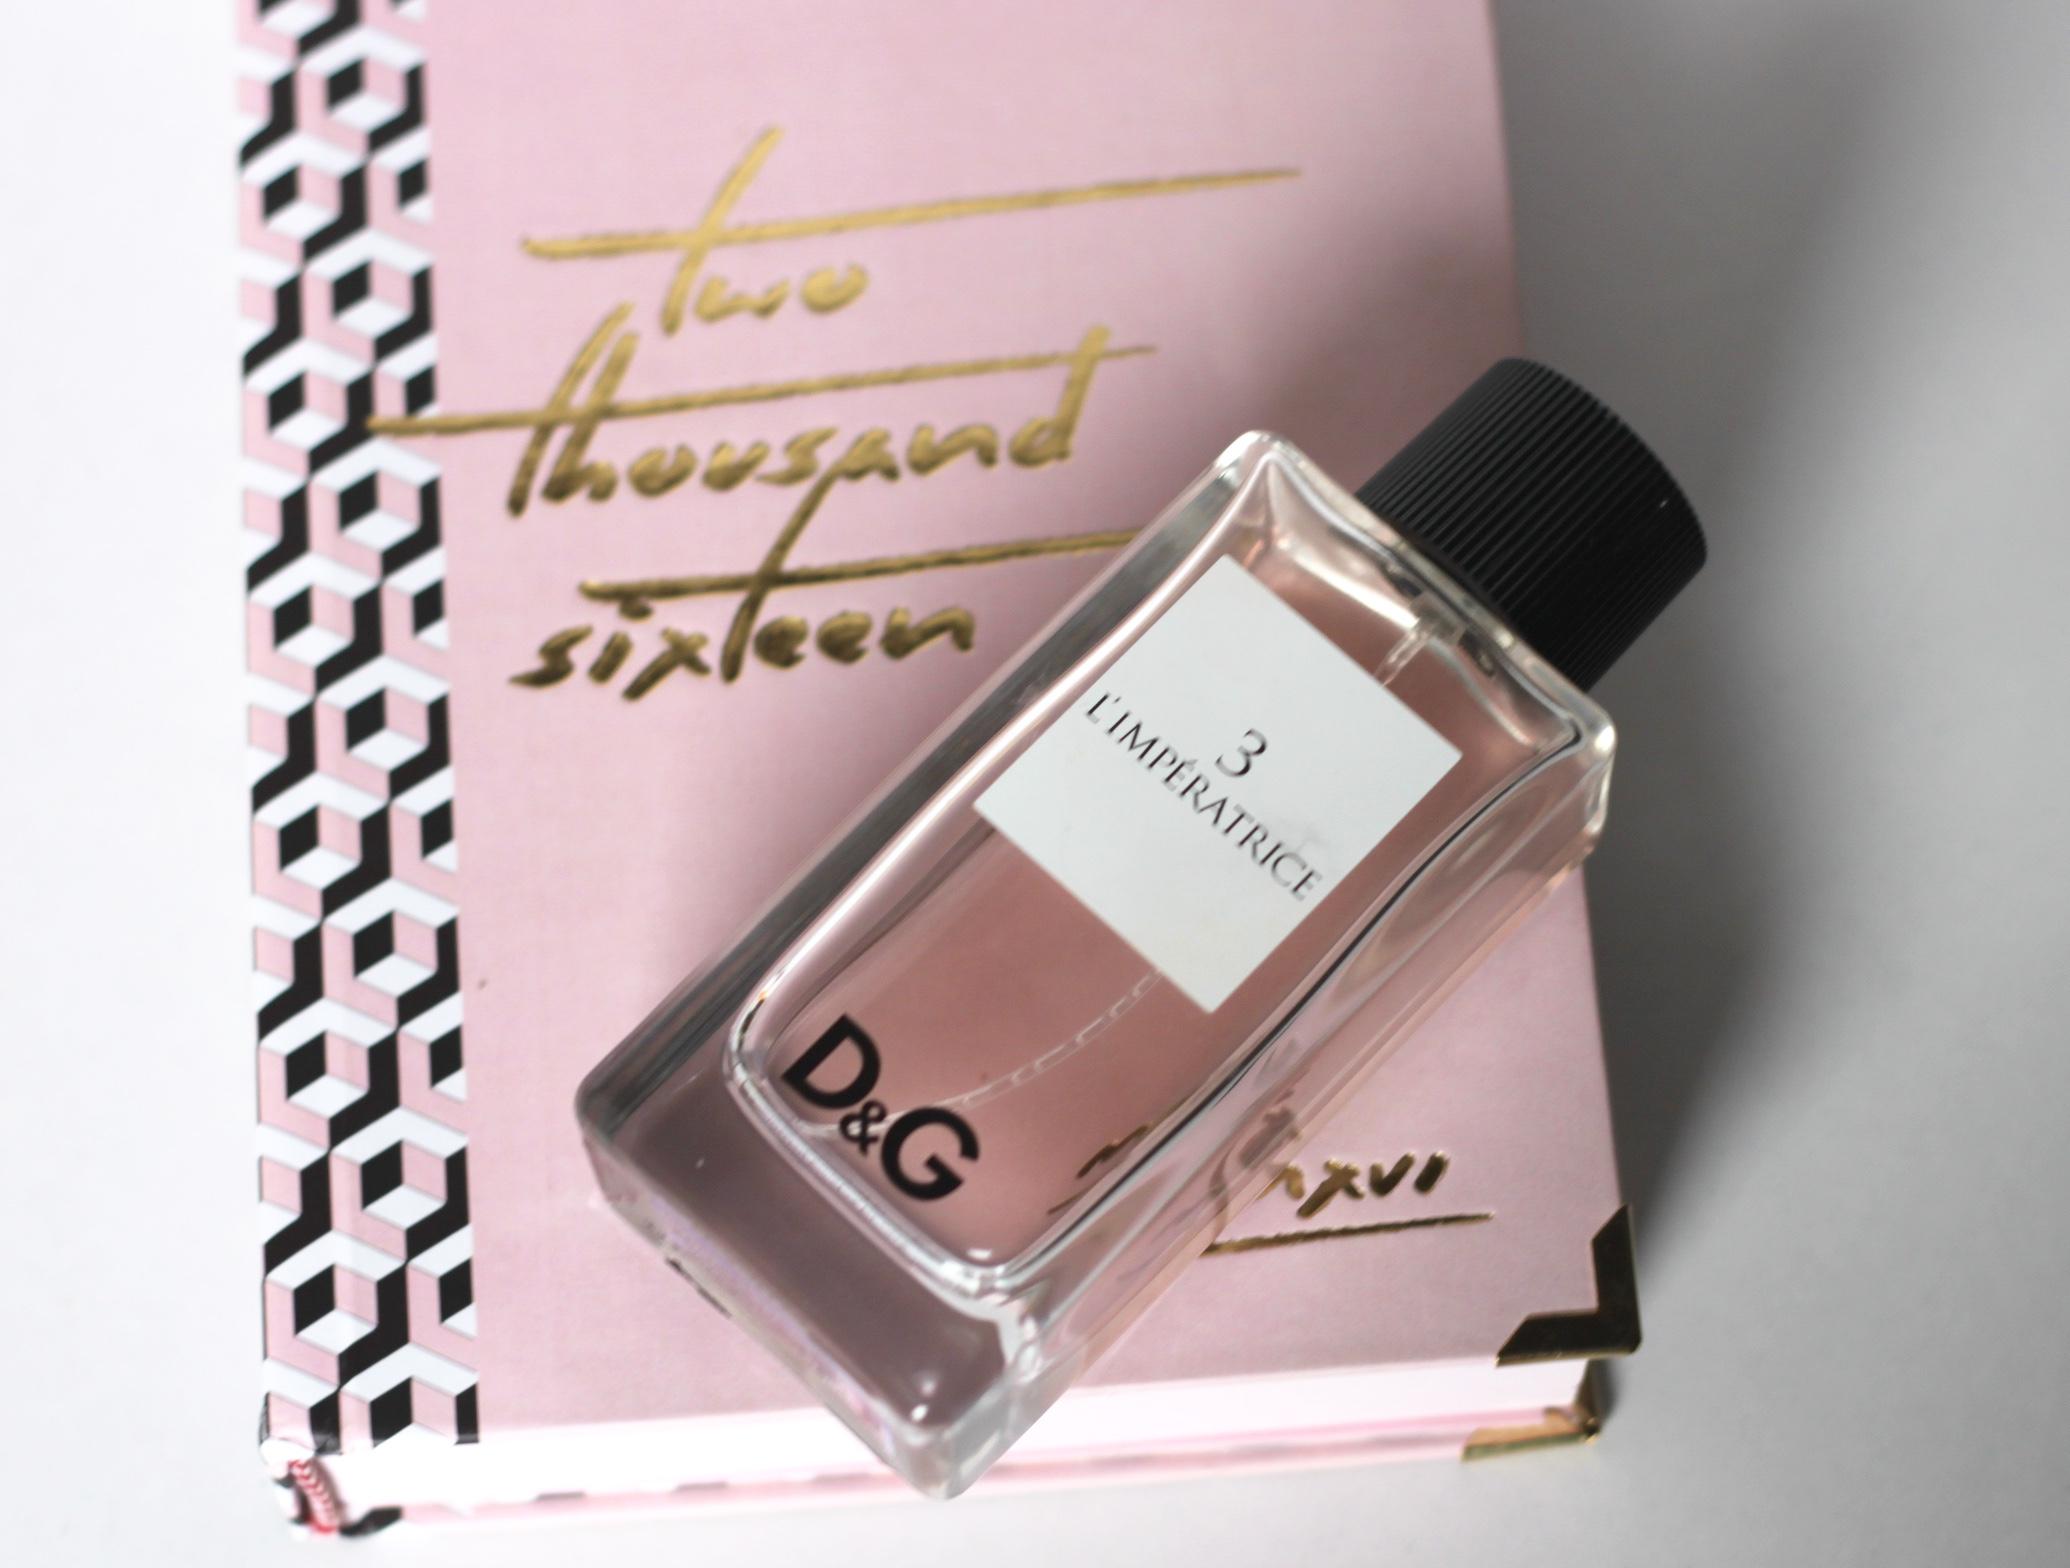 My 2015 Skincare Favorites, d&g perfume